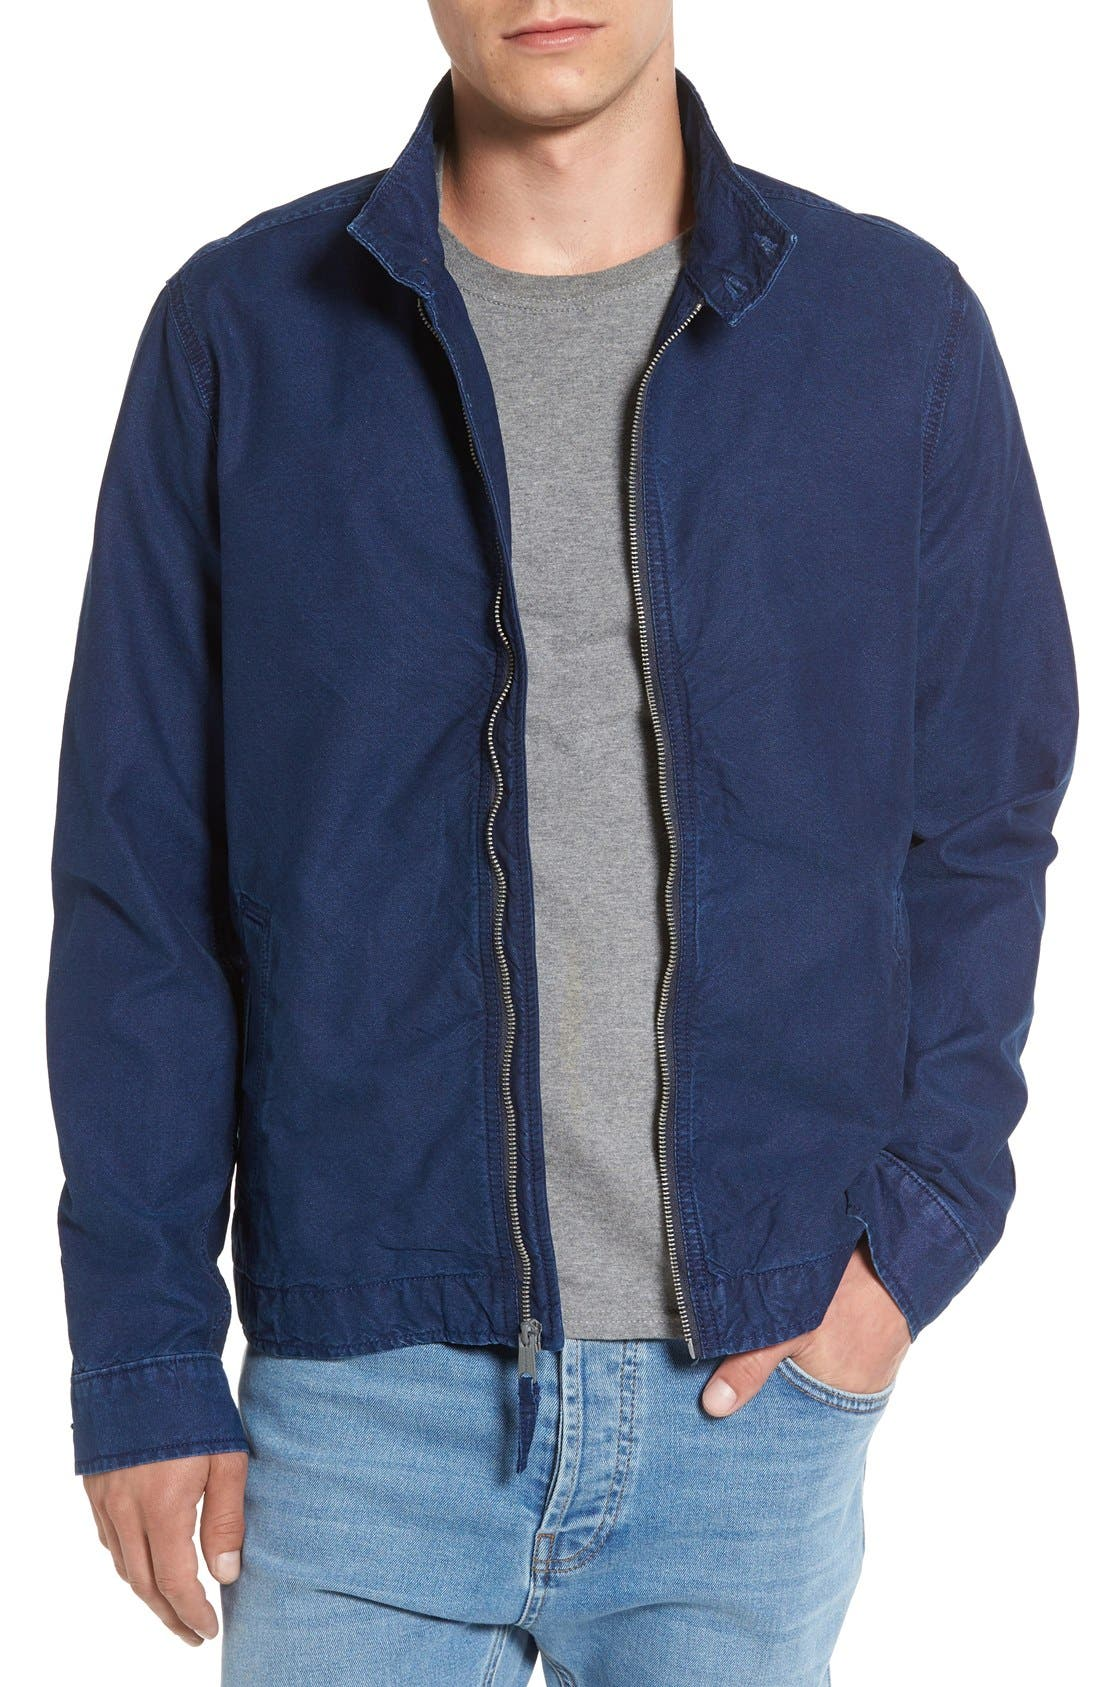 LUCKY BRAND,                             Denim Harrington Jacket,                             Main thumbnail 1, color,                             410